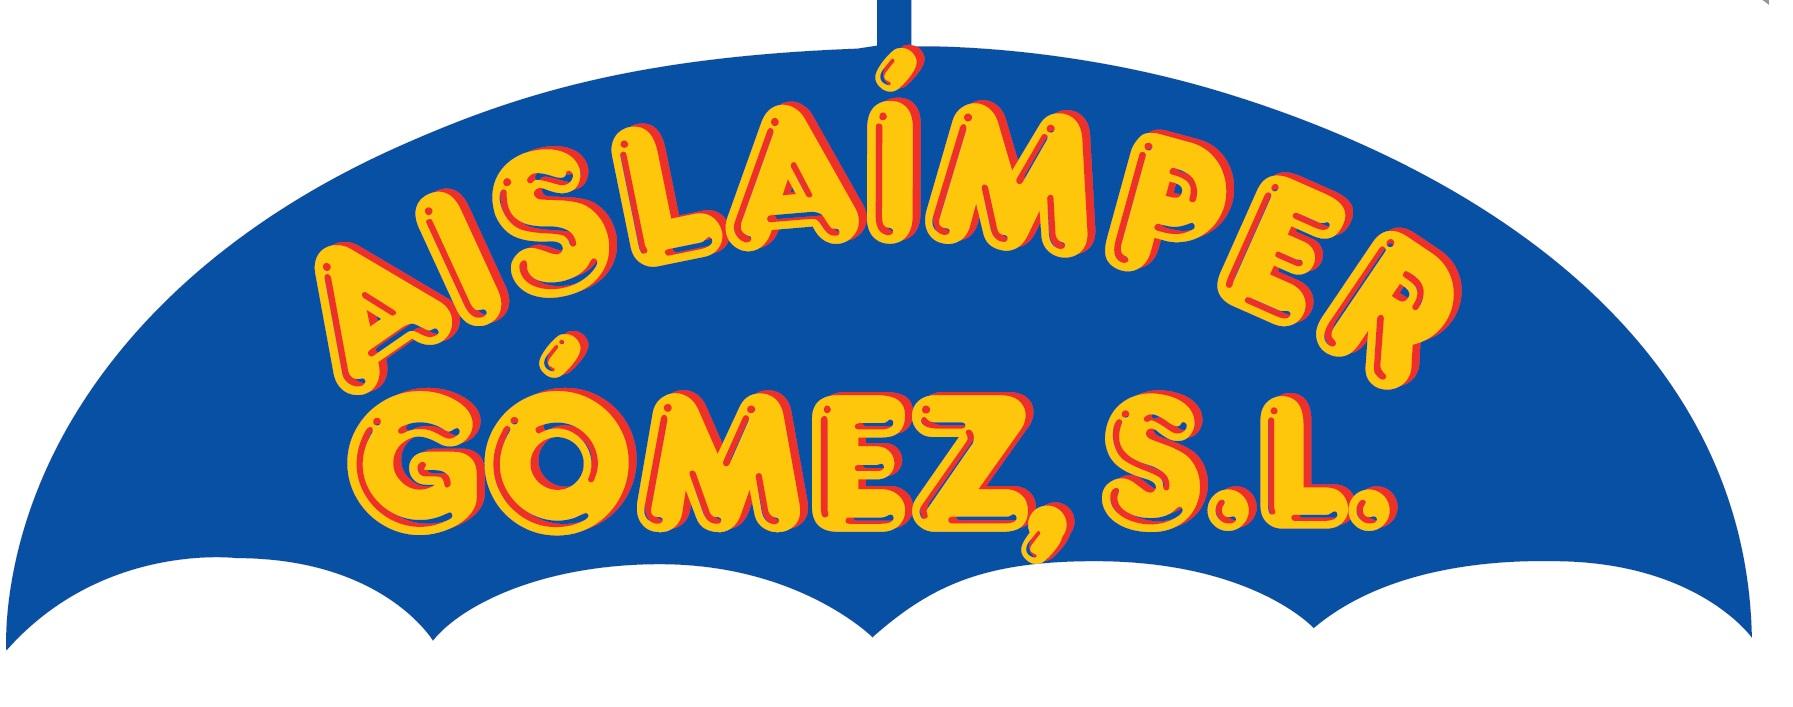 Aislaimper Gómez